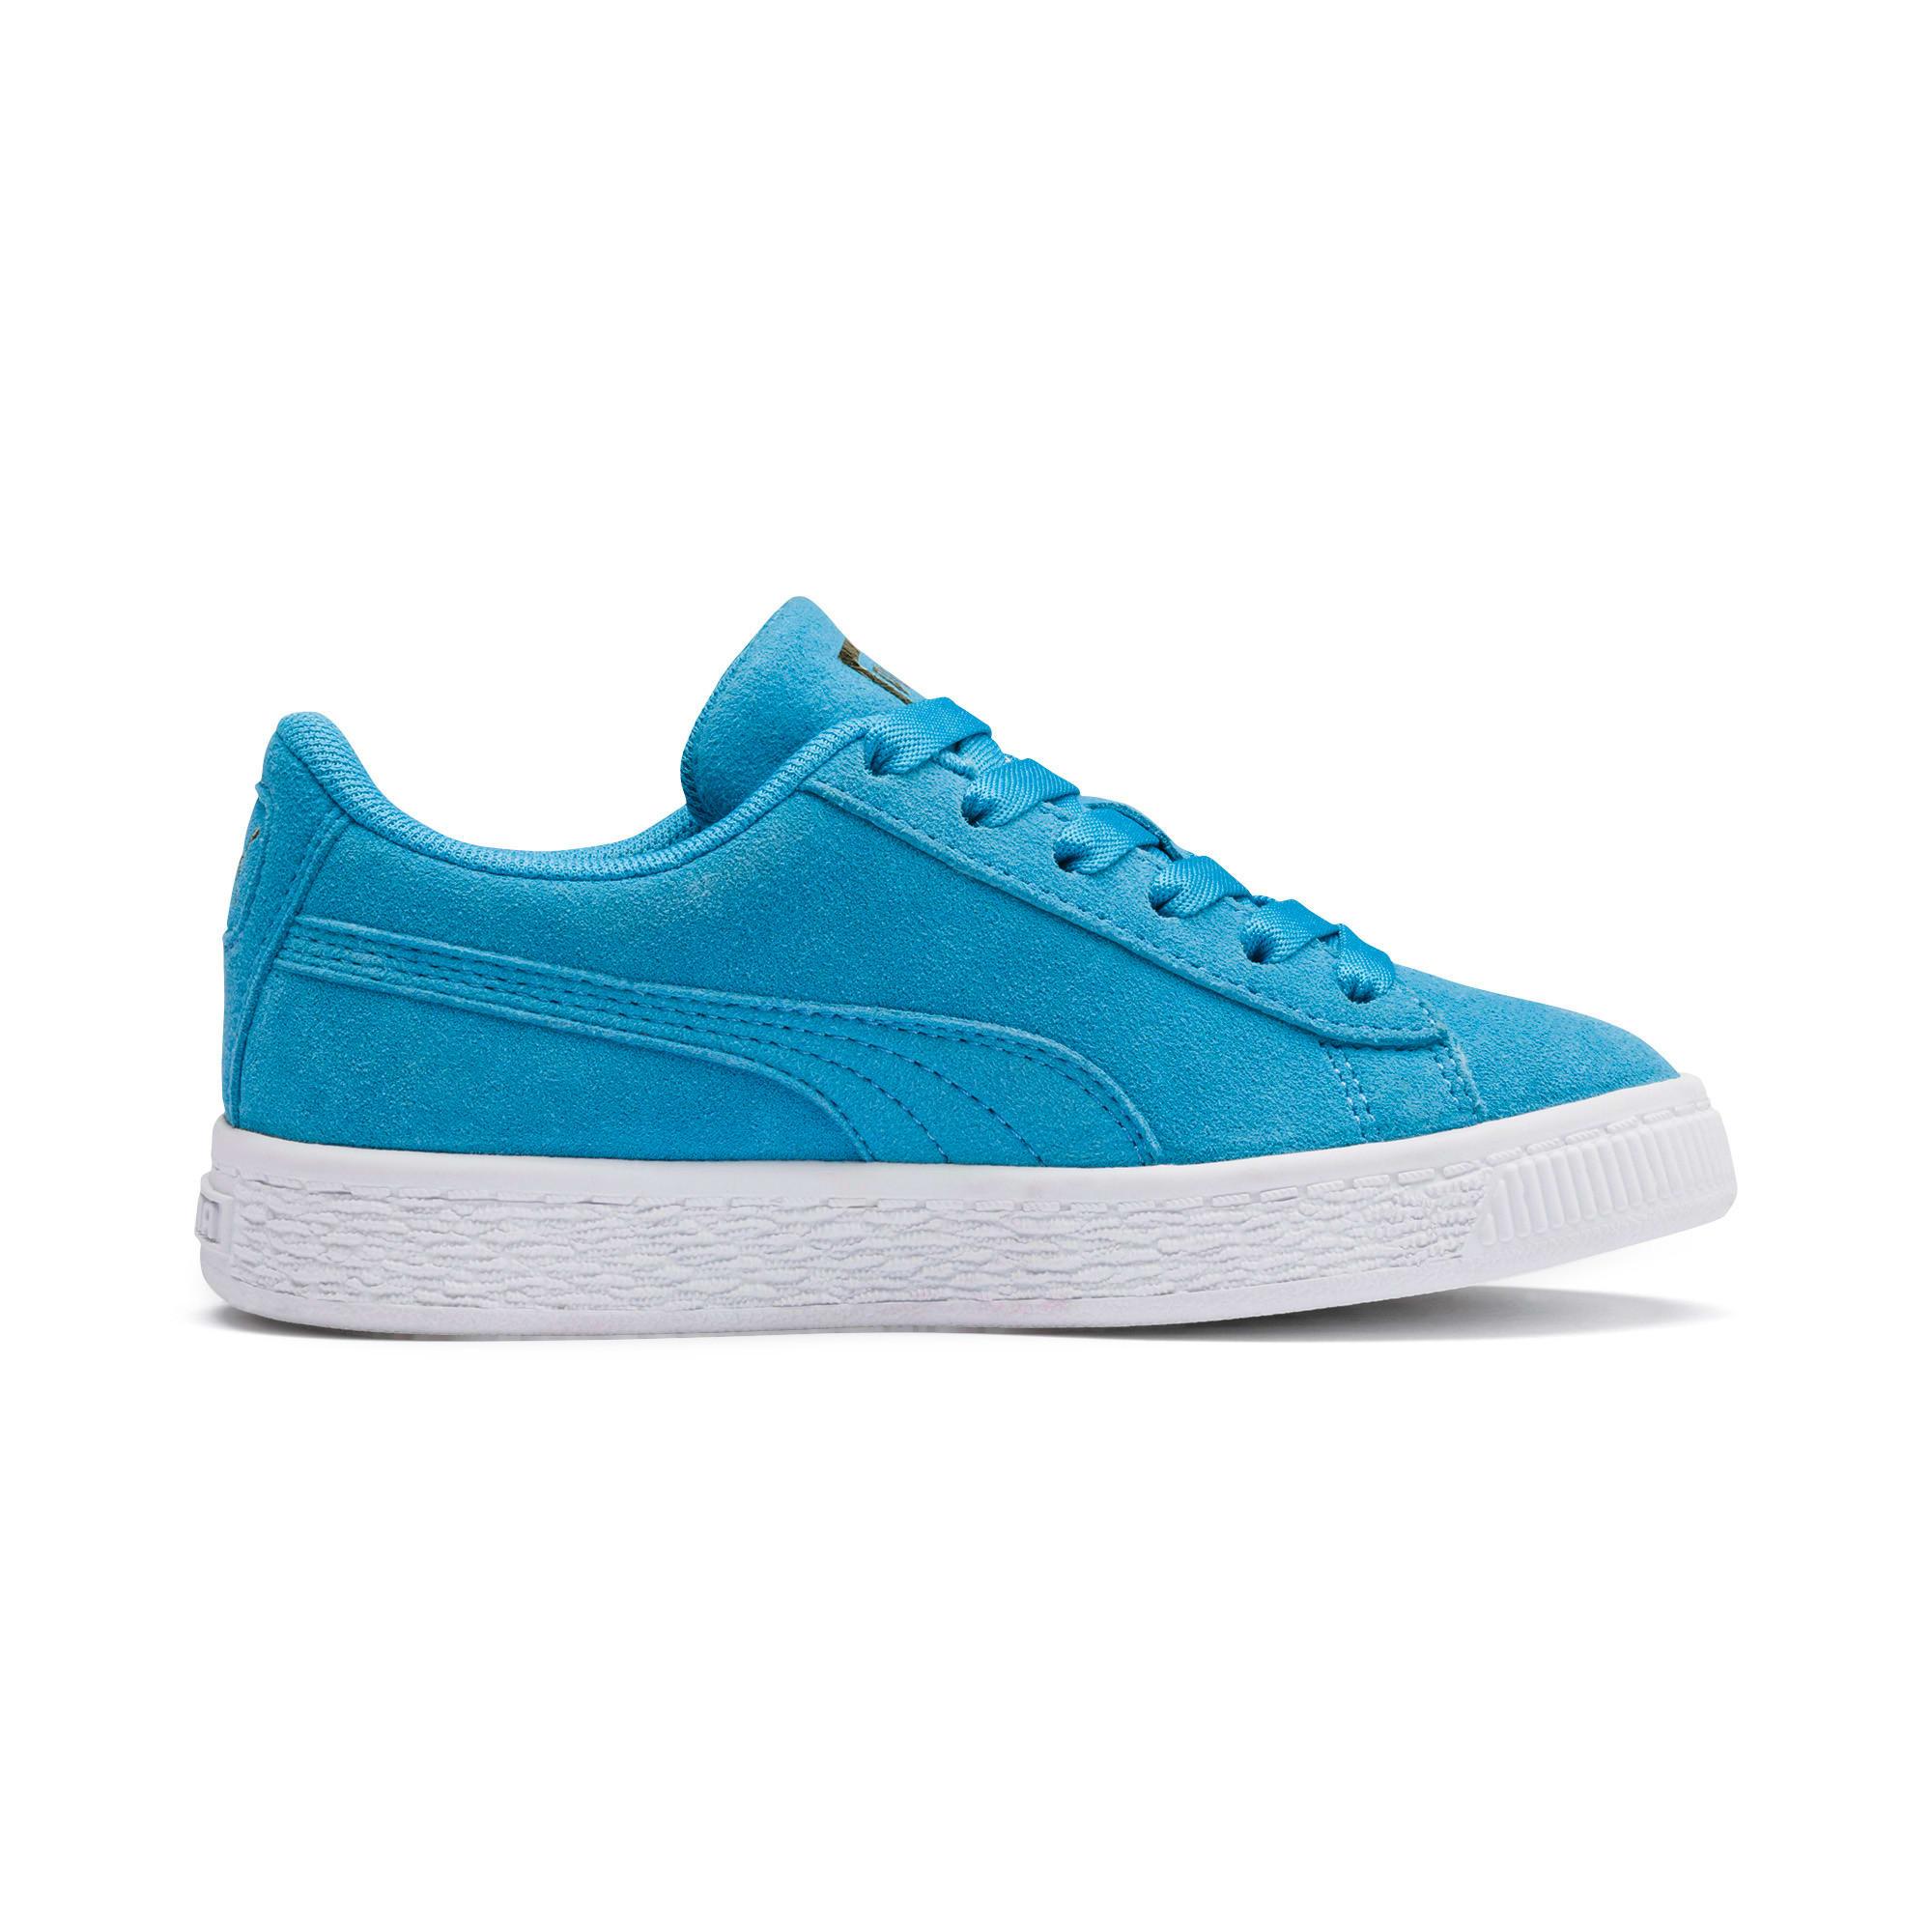 Thumbnail 5 of Sesamstraße 50 Suede Statement Kids Sneaker, Bleu Azur-Puma White, medium